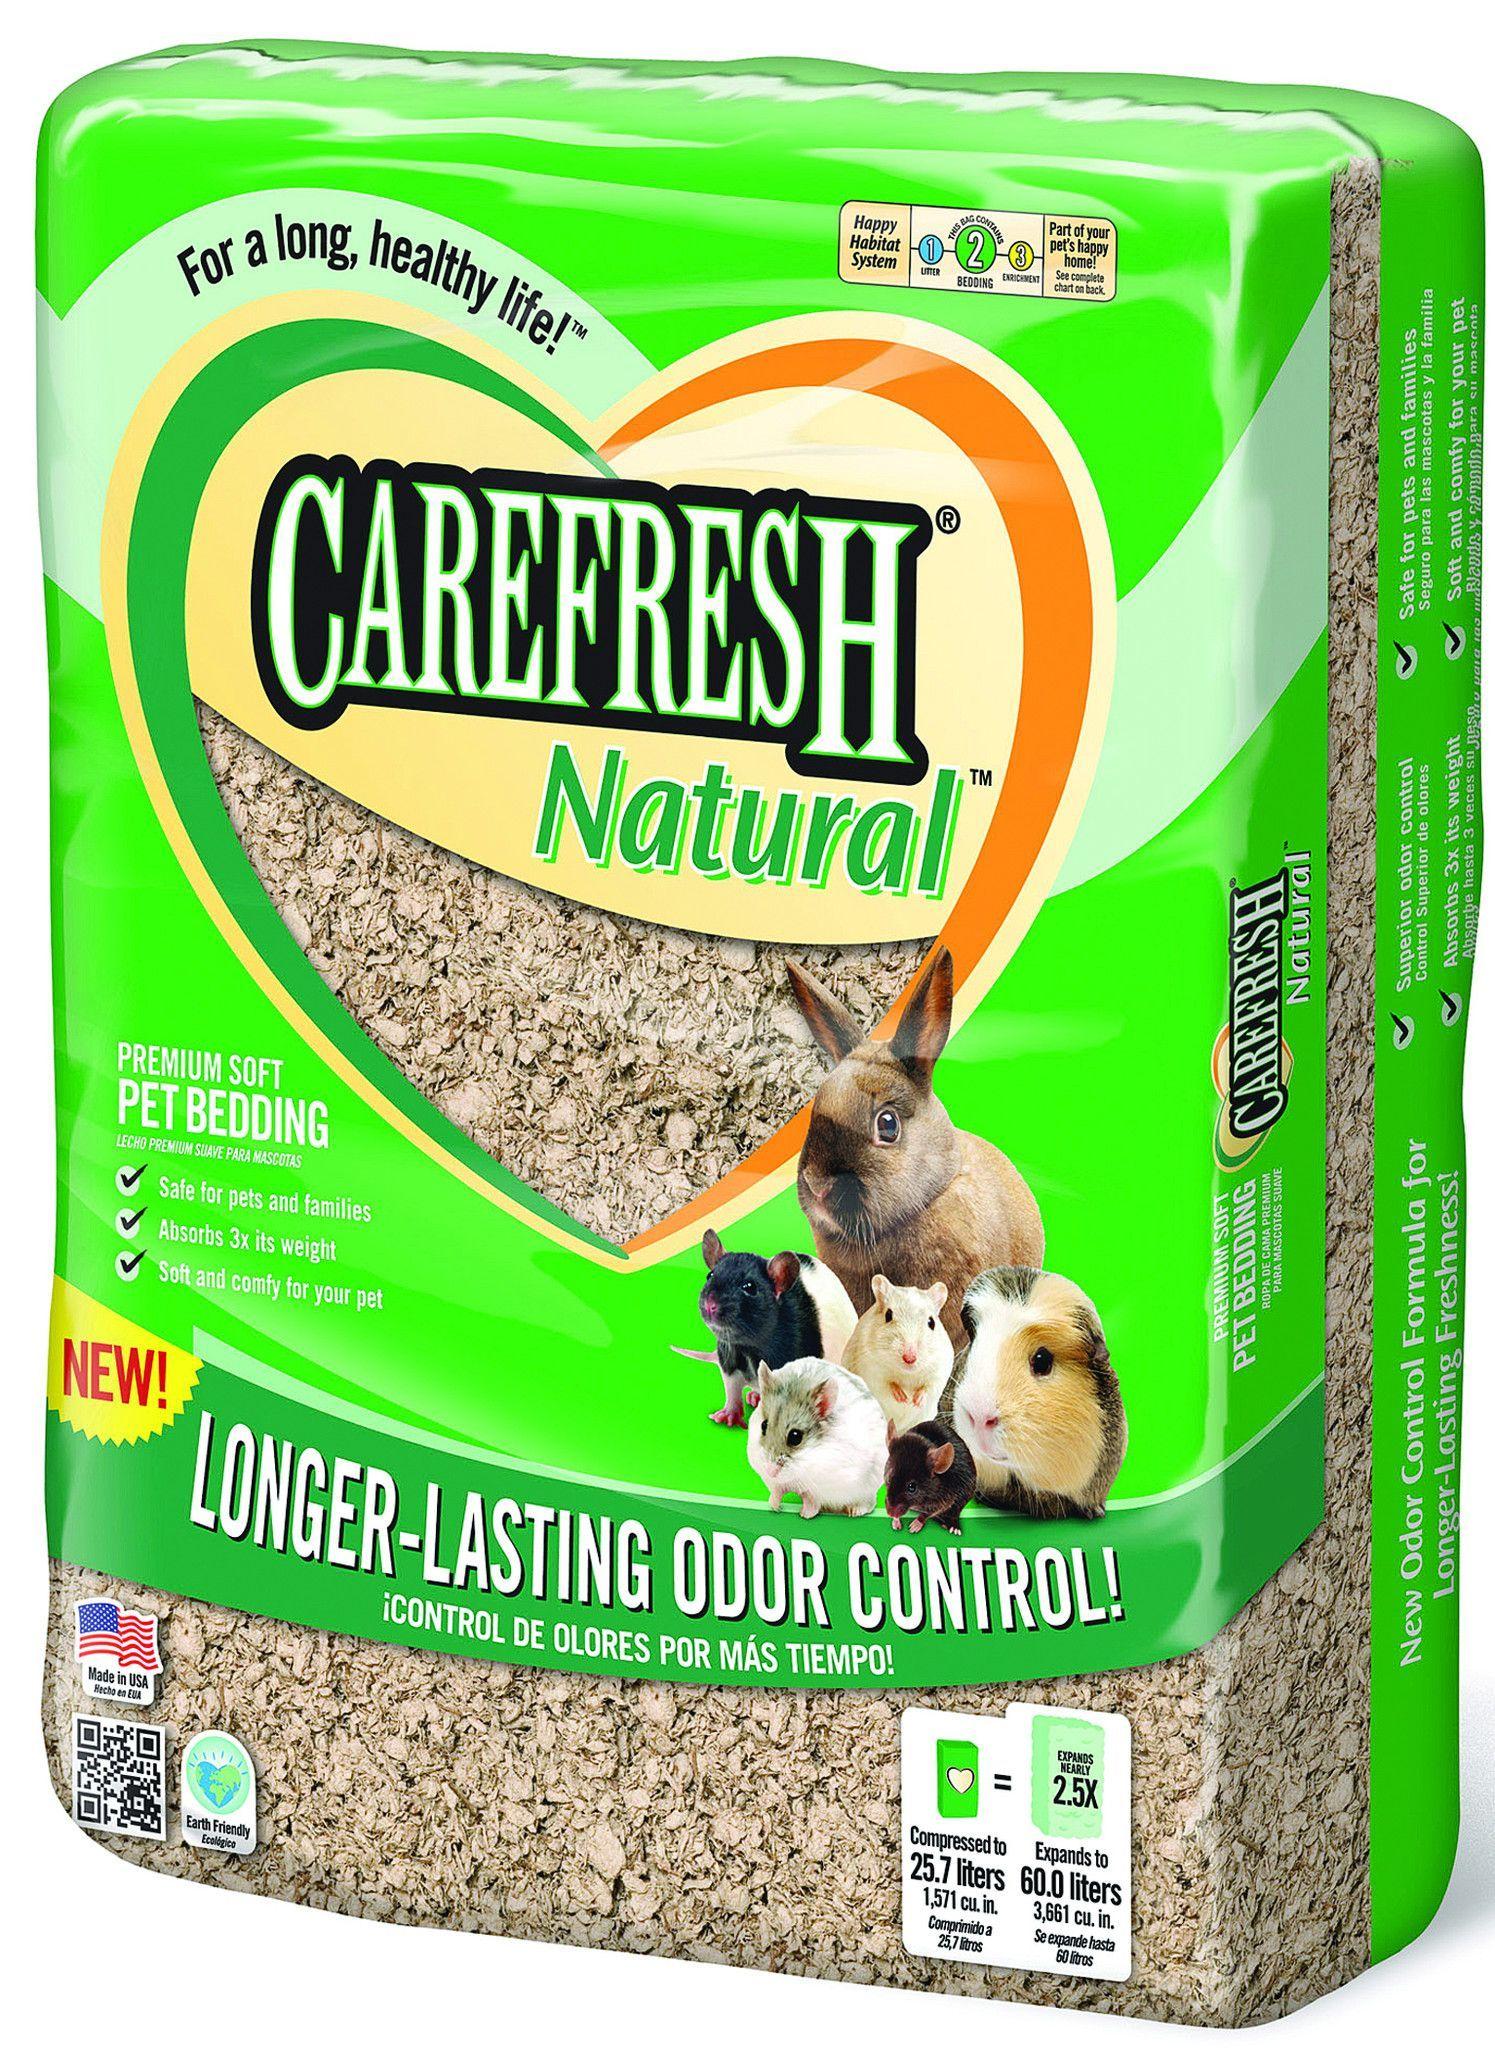 CAREFRESH COMPLETE NATURAL PREMIUM SOFT BEDDING Hamster